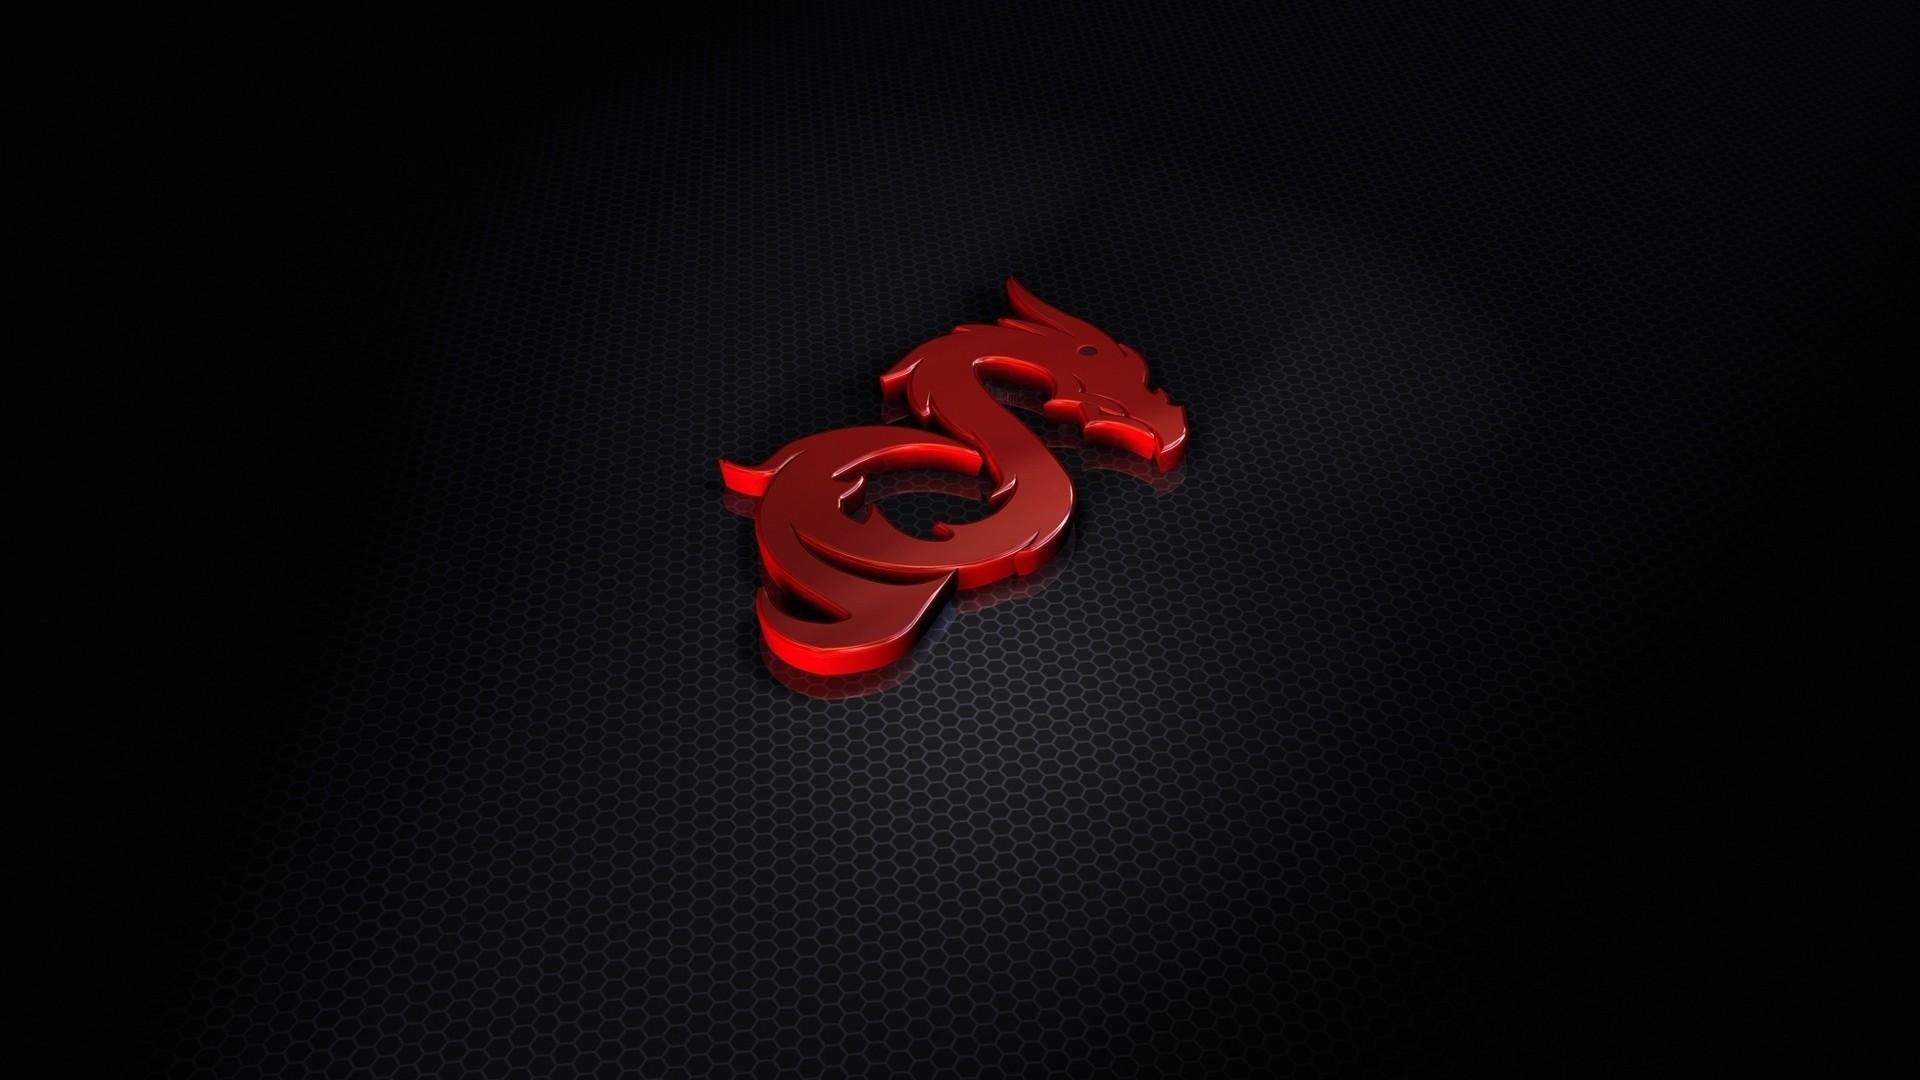 dragonlogo | Explore dragonlogo on DeviantArt